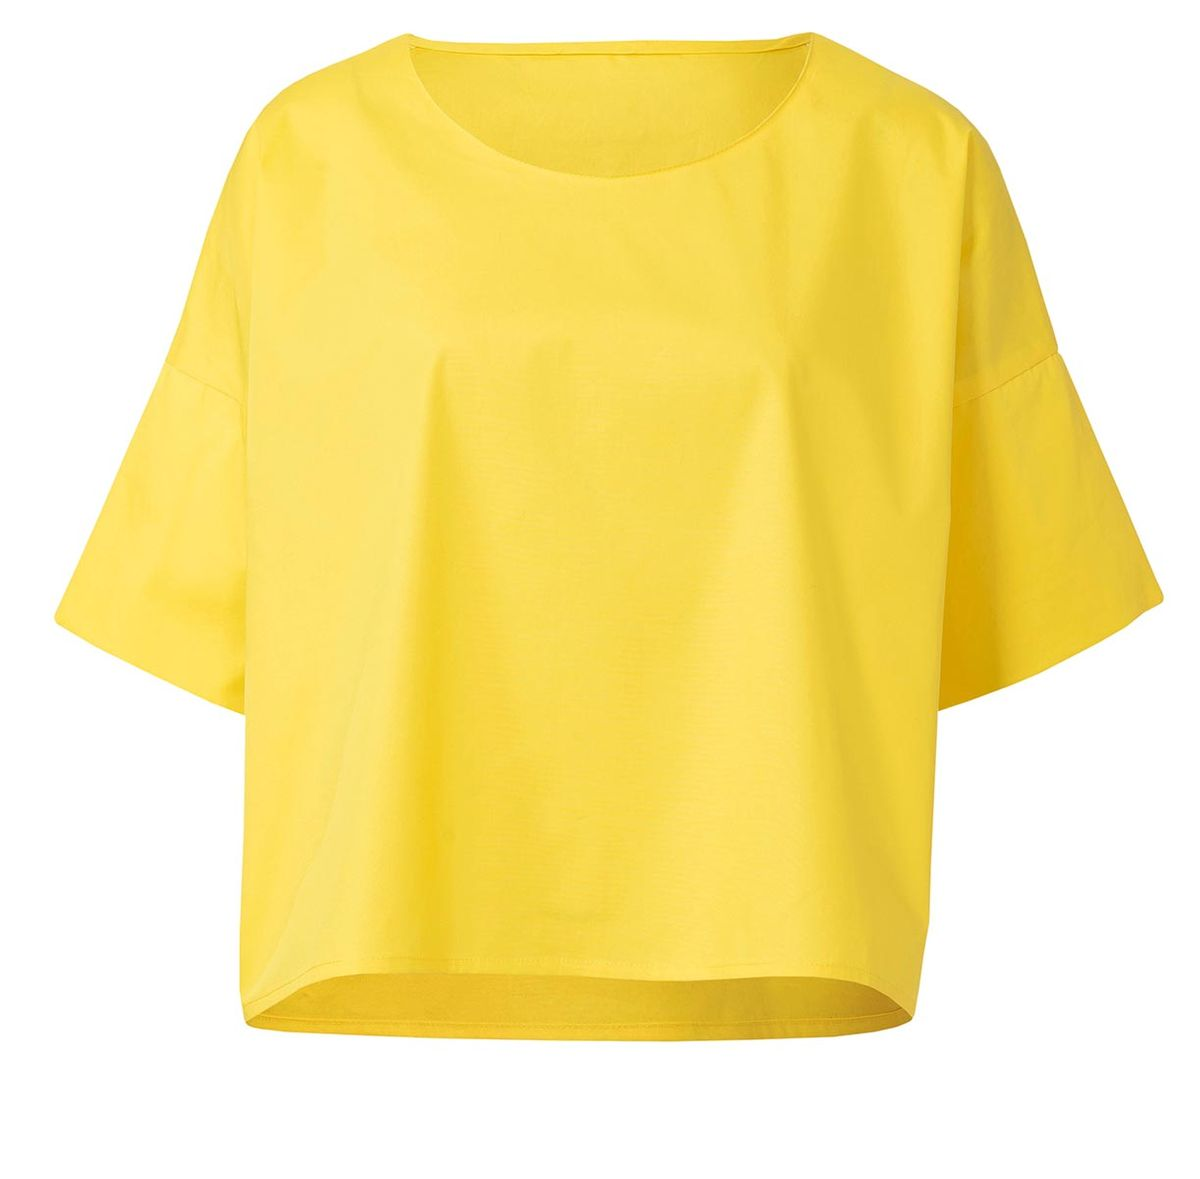 Patron de tee-shirt - Burda 6243